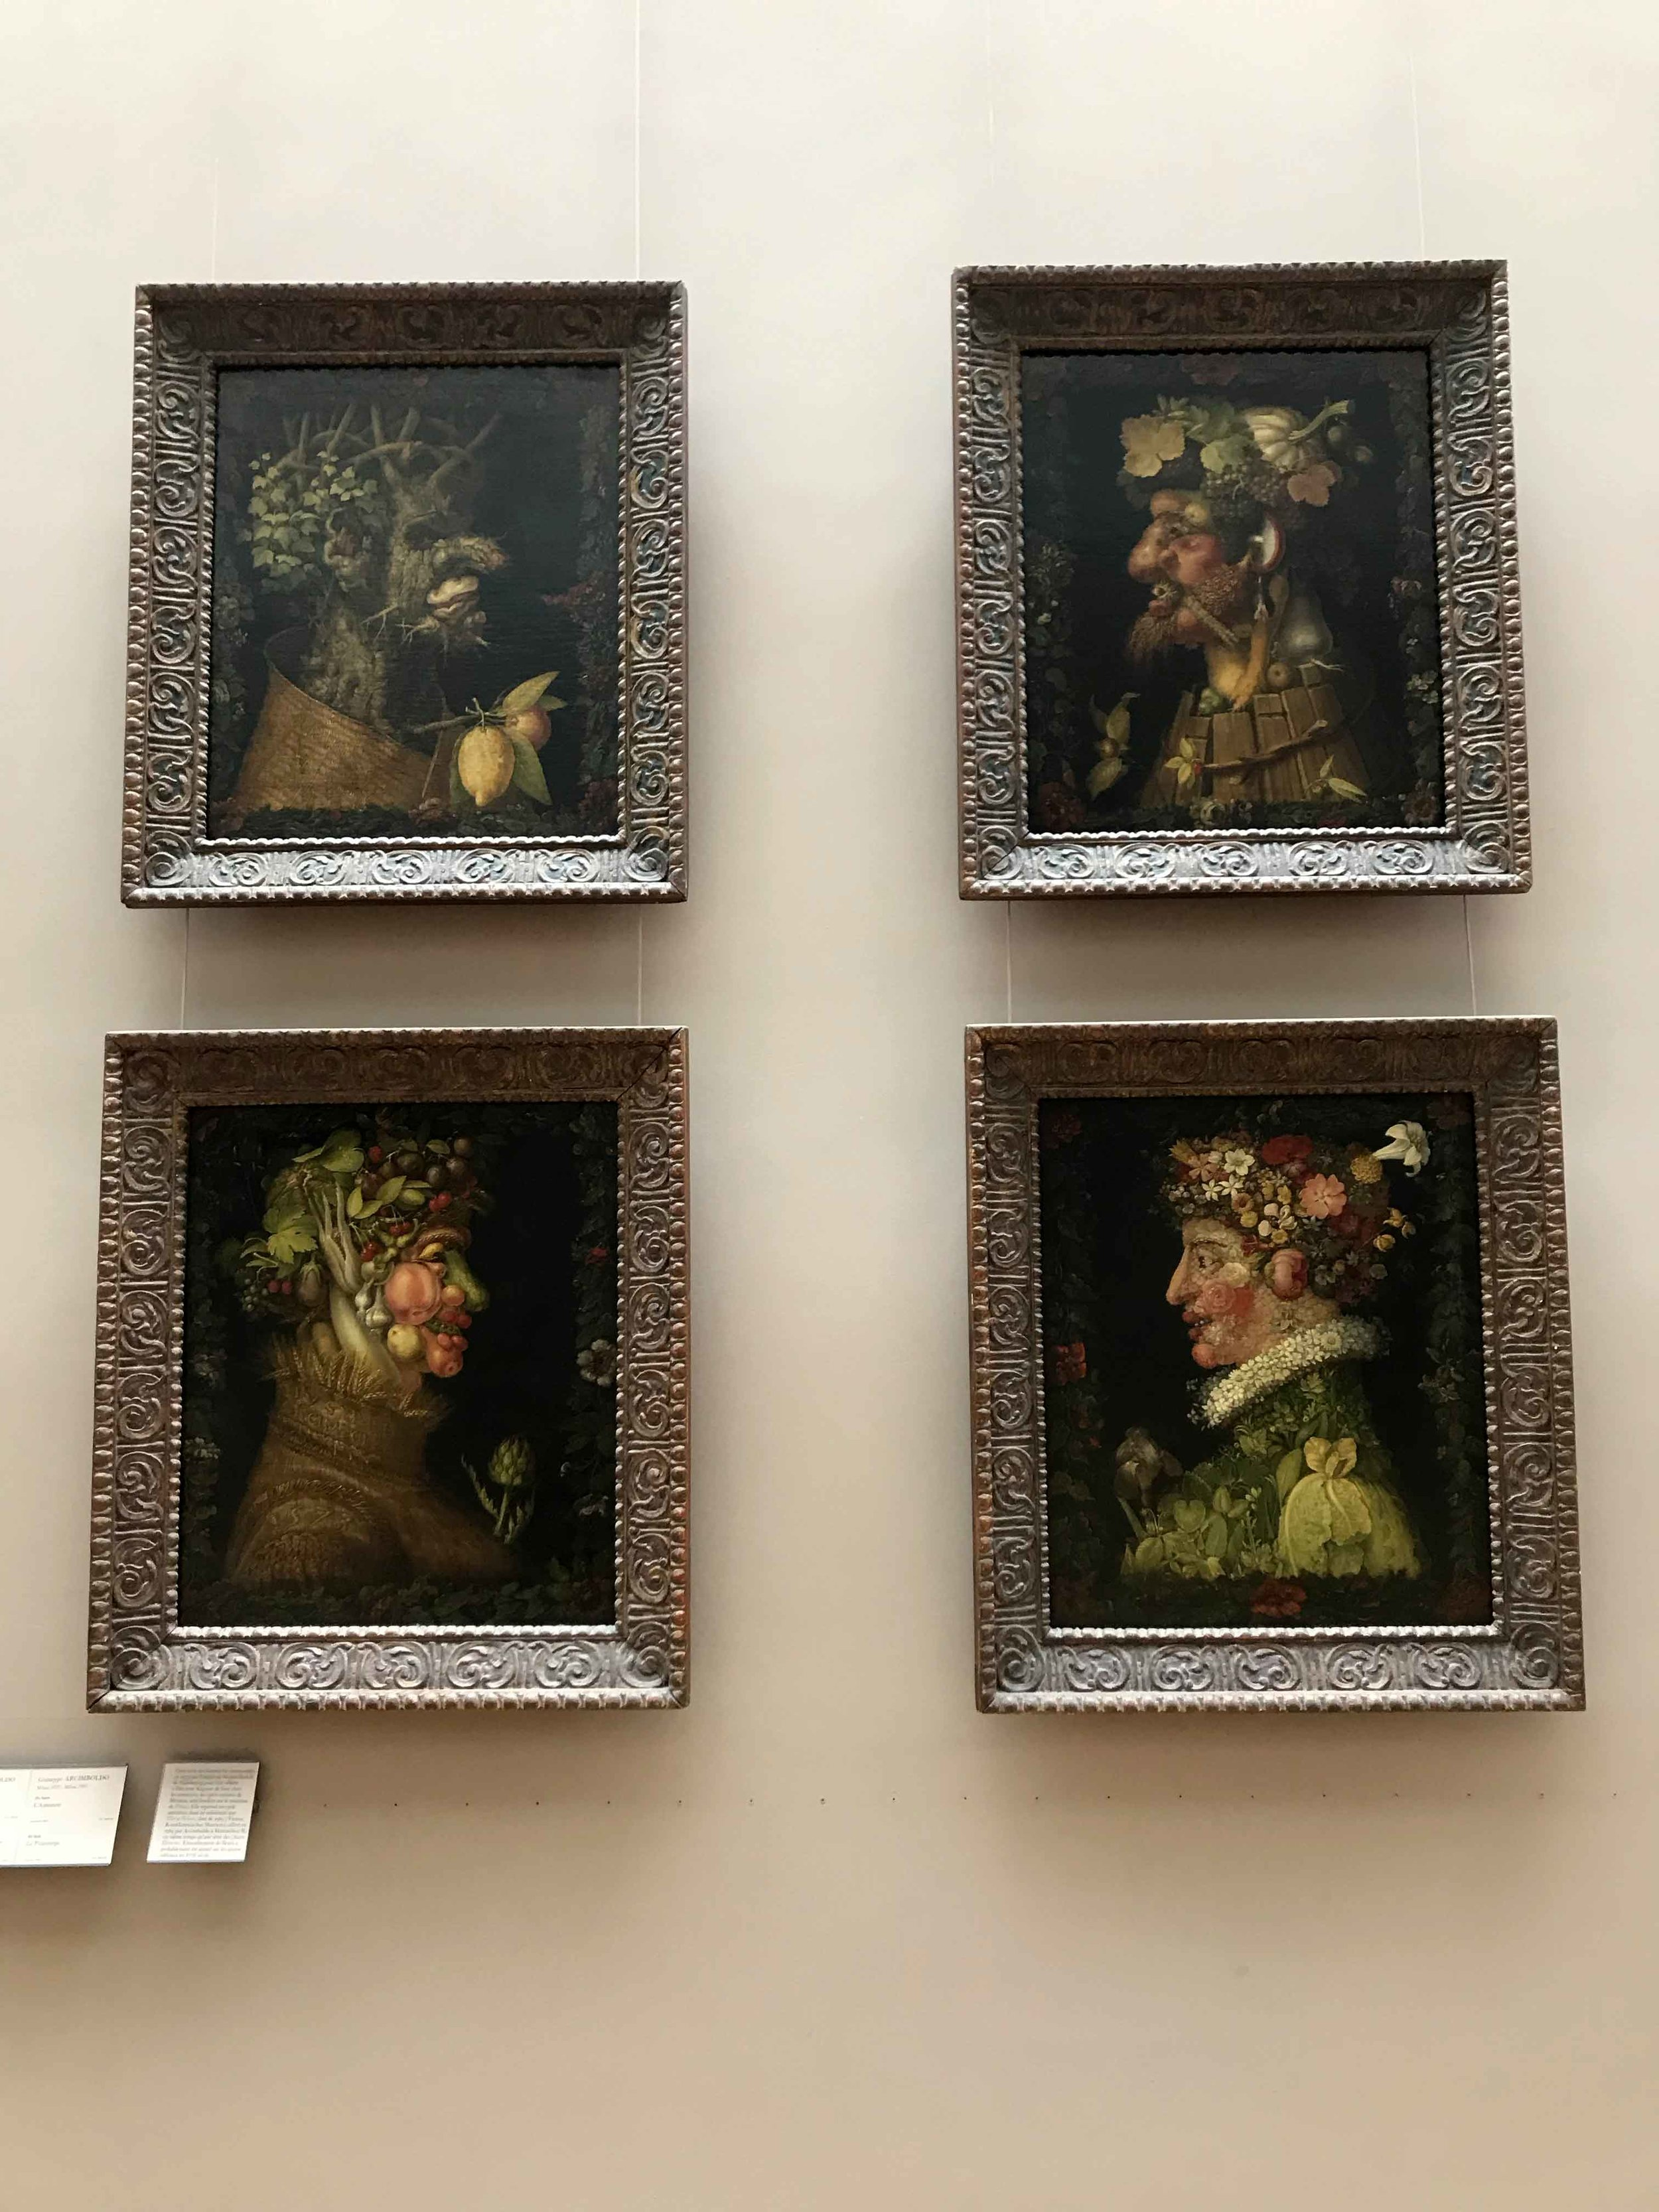 The Four Seasons - Giuseppe Arcimboldo